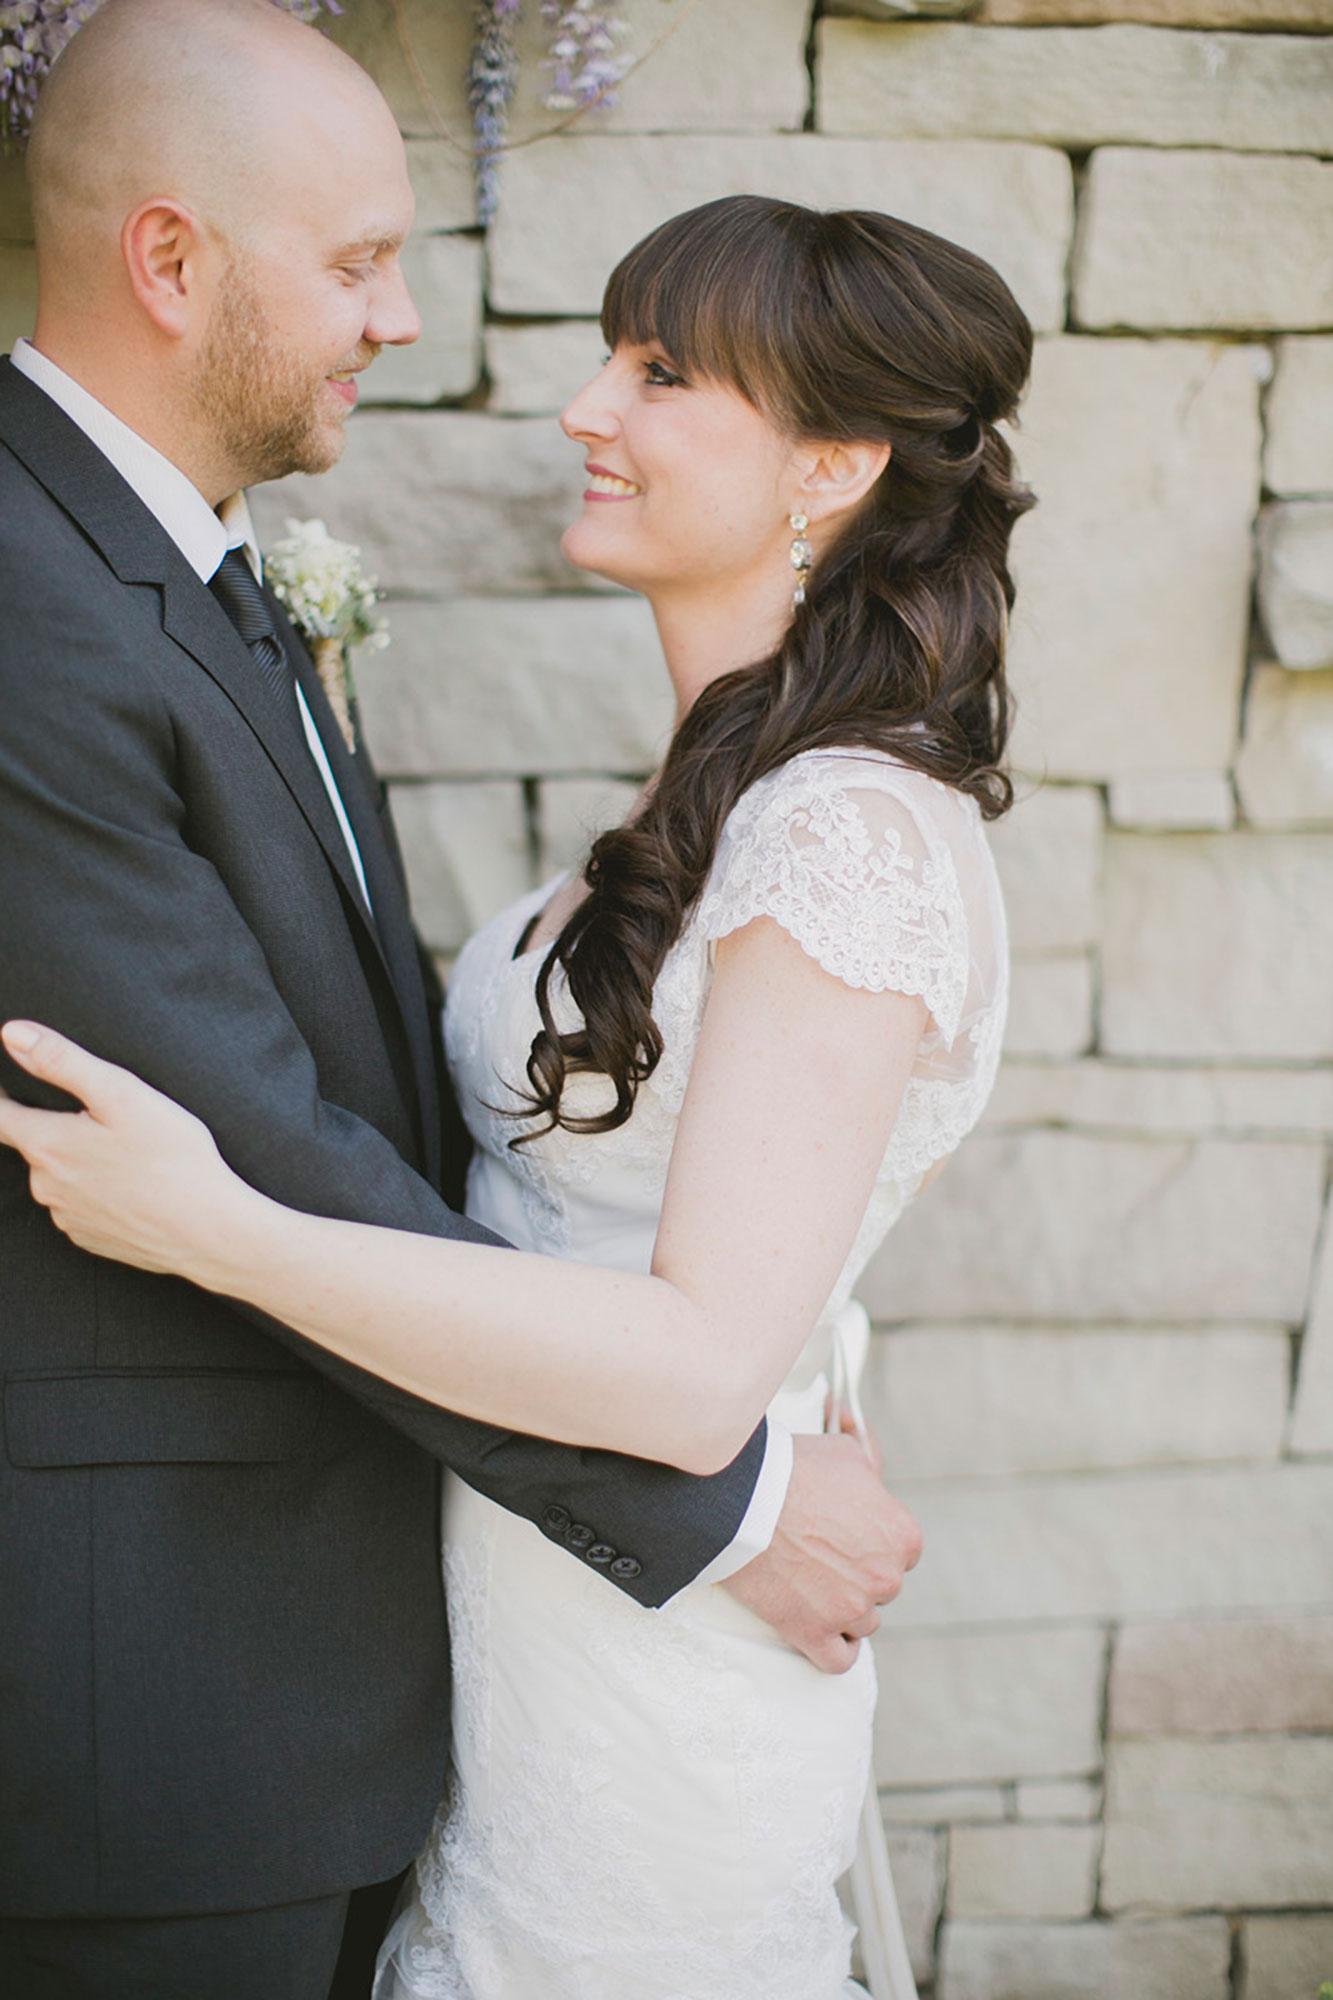 Balls-Falls-Vineyard-Bride-Photo-By-Elizabeth-in-Love-018.jpg